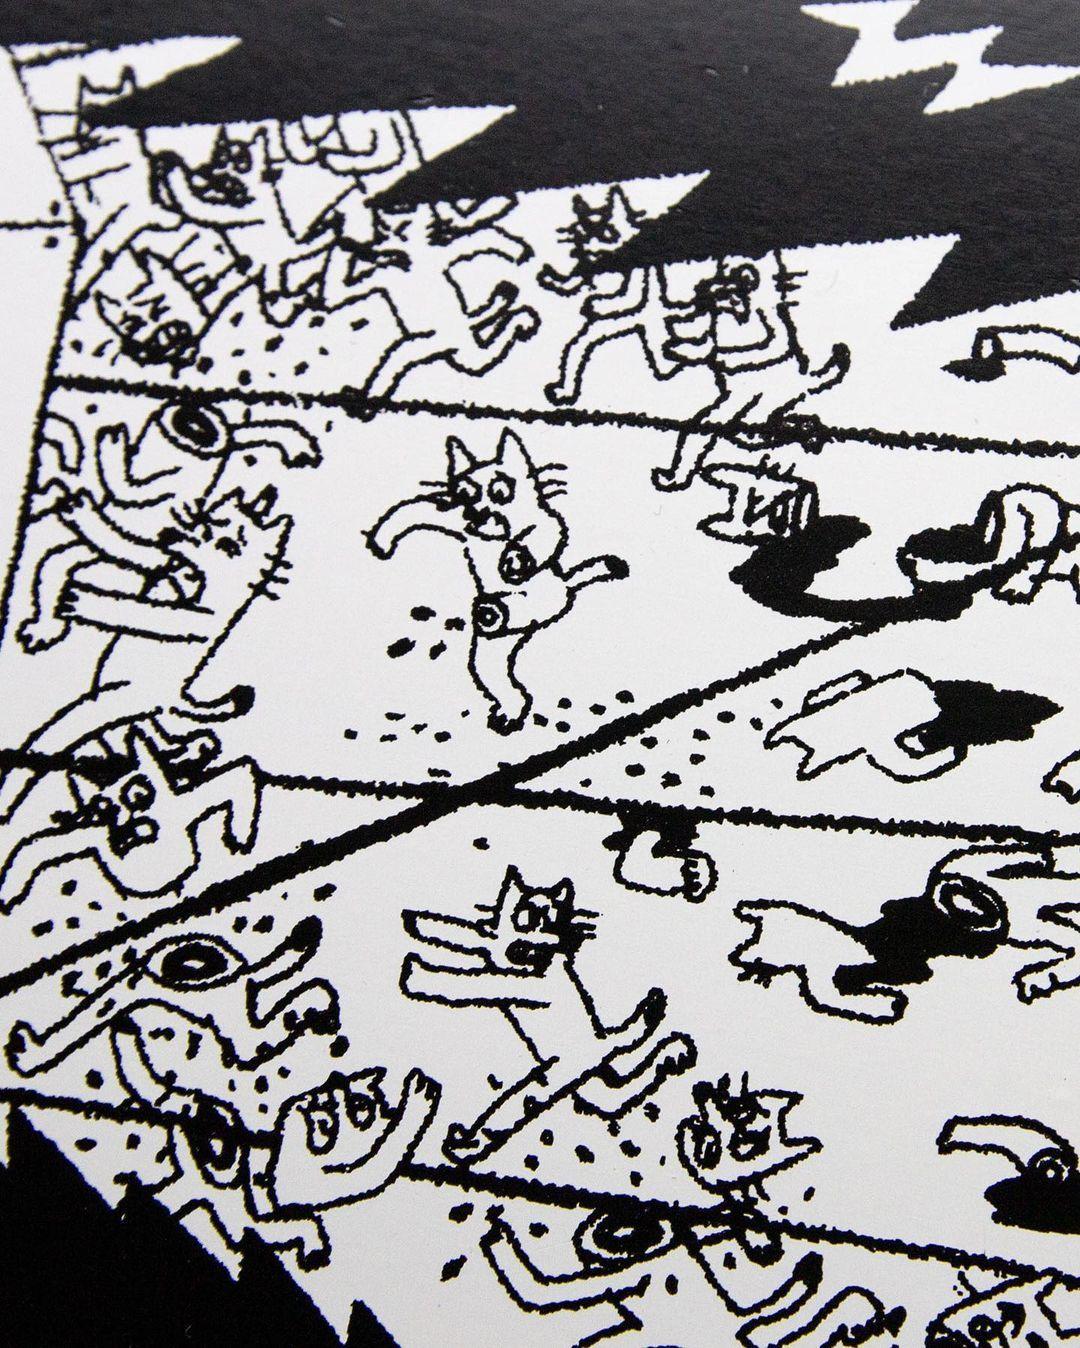 Death War 3000 Series By Christy Karacas X Deathwish Skateboards 4